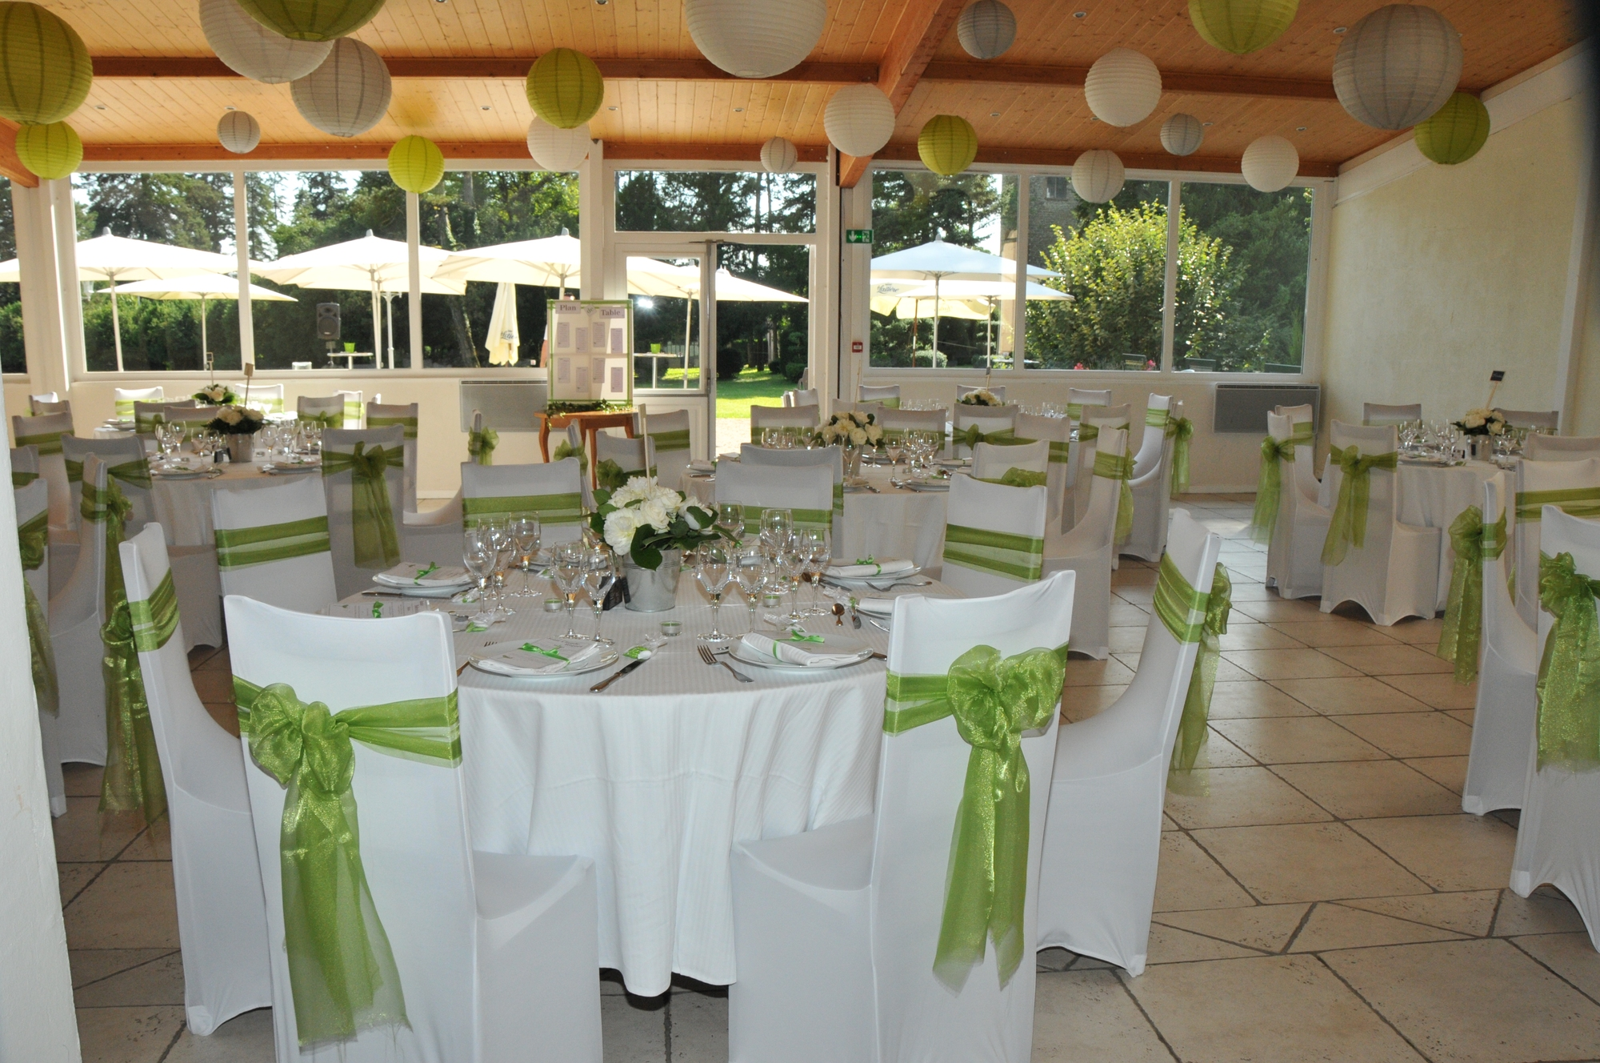 Salle des Cèdres mariage champêtre